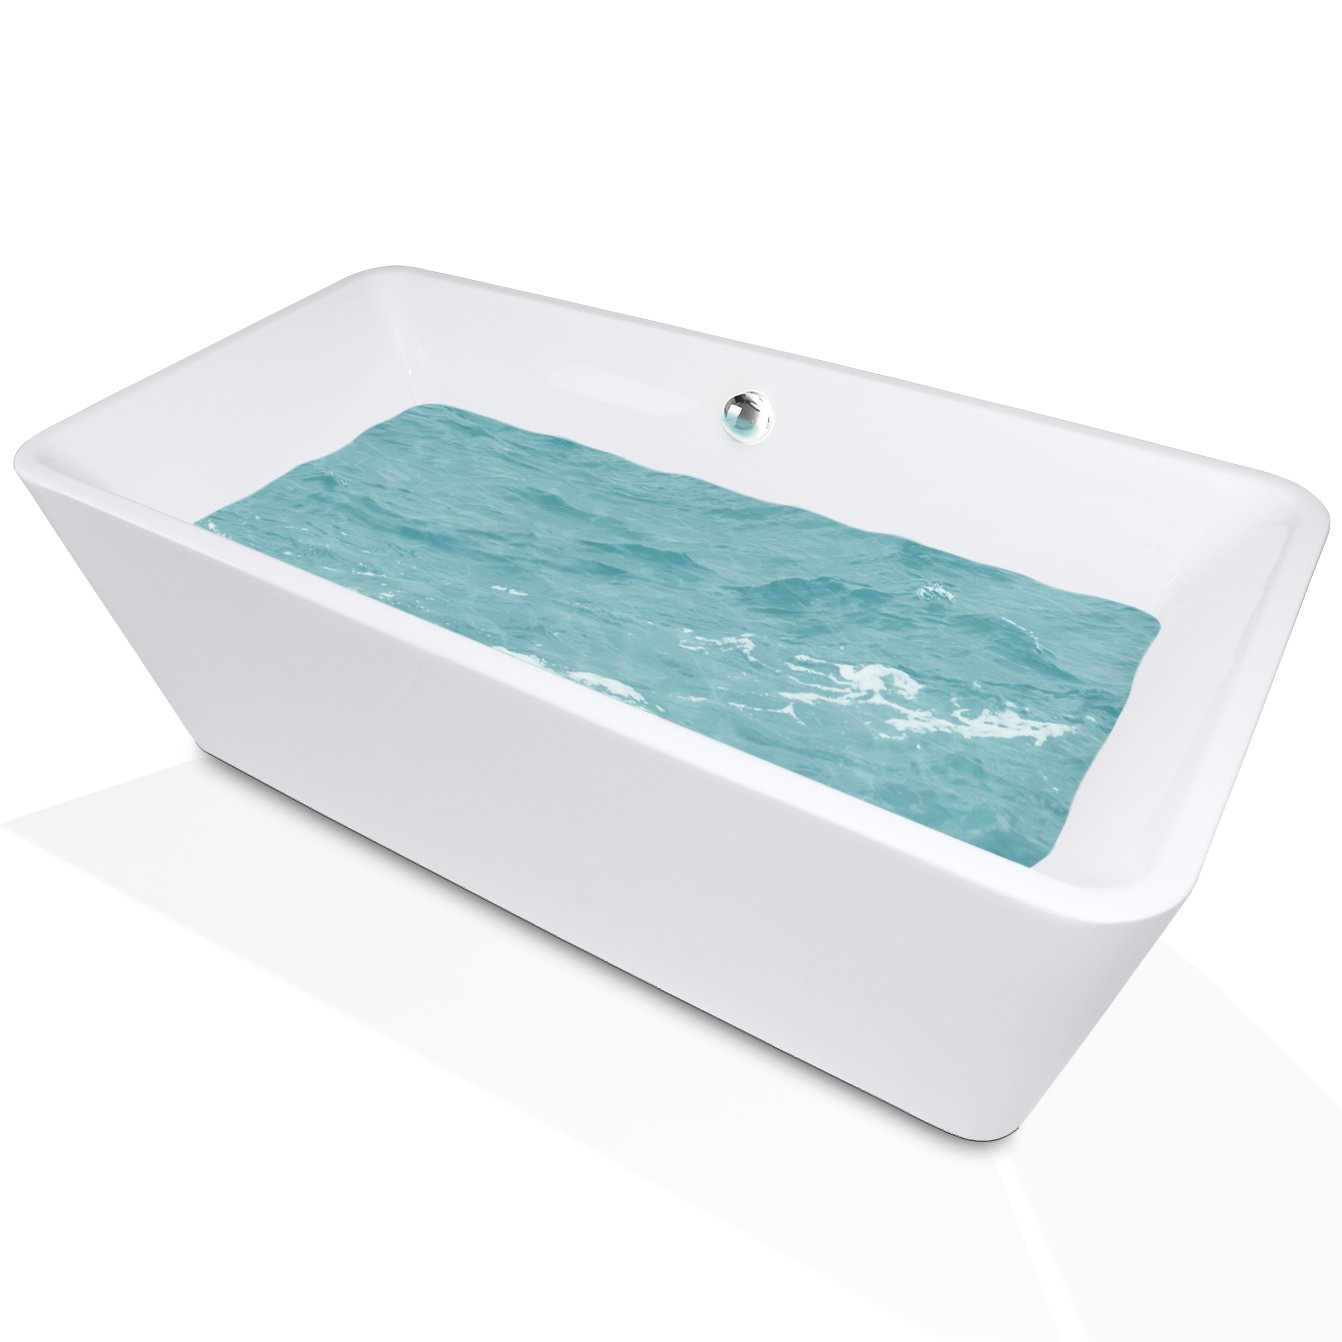 AKDY F245 Bathroom White Color Free Standing Acrylic Bathtub